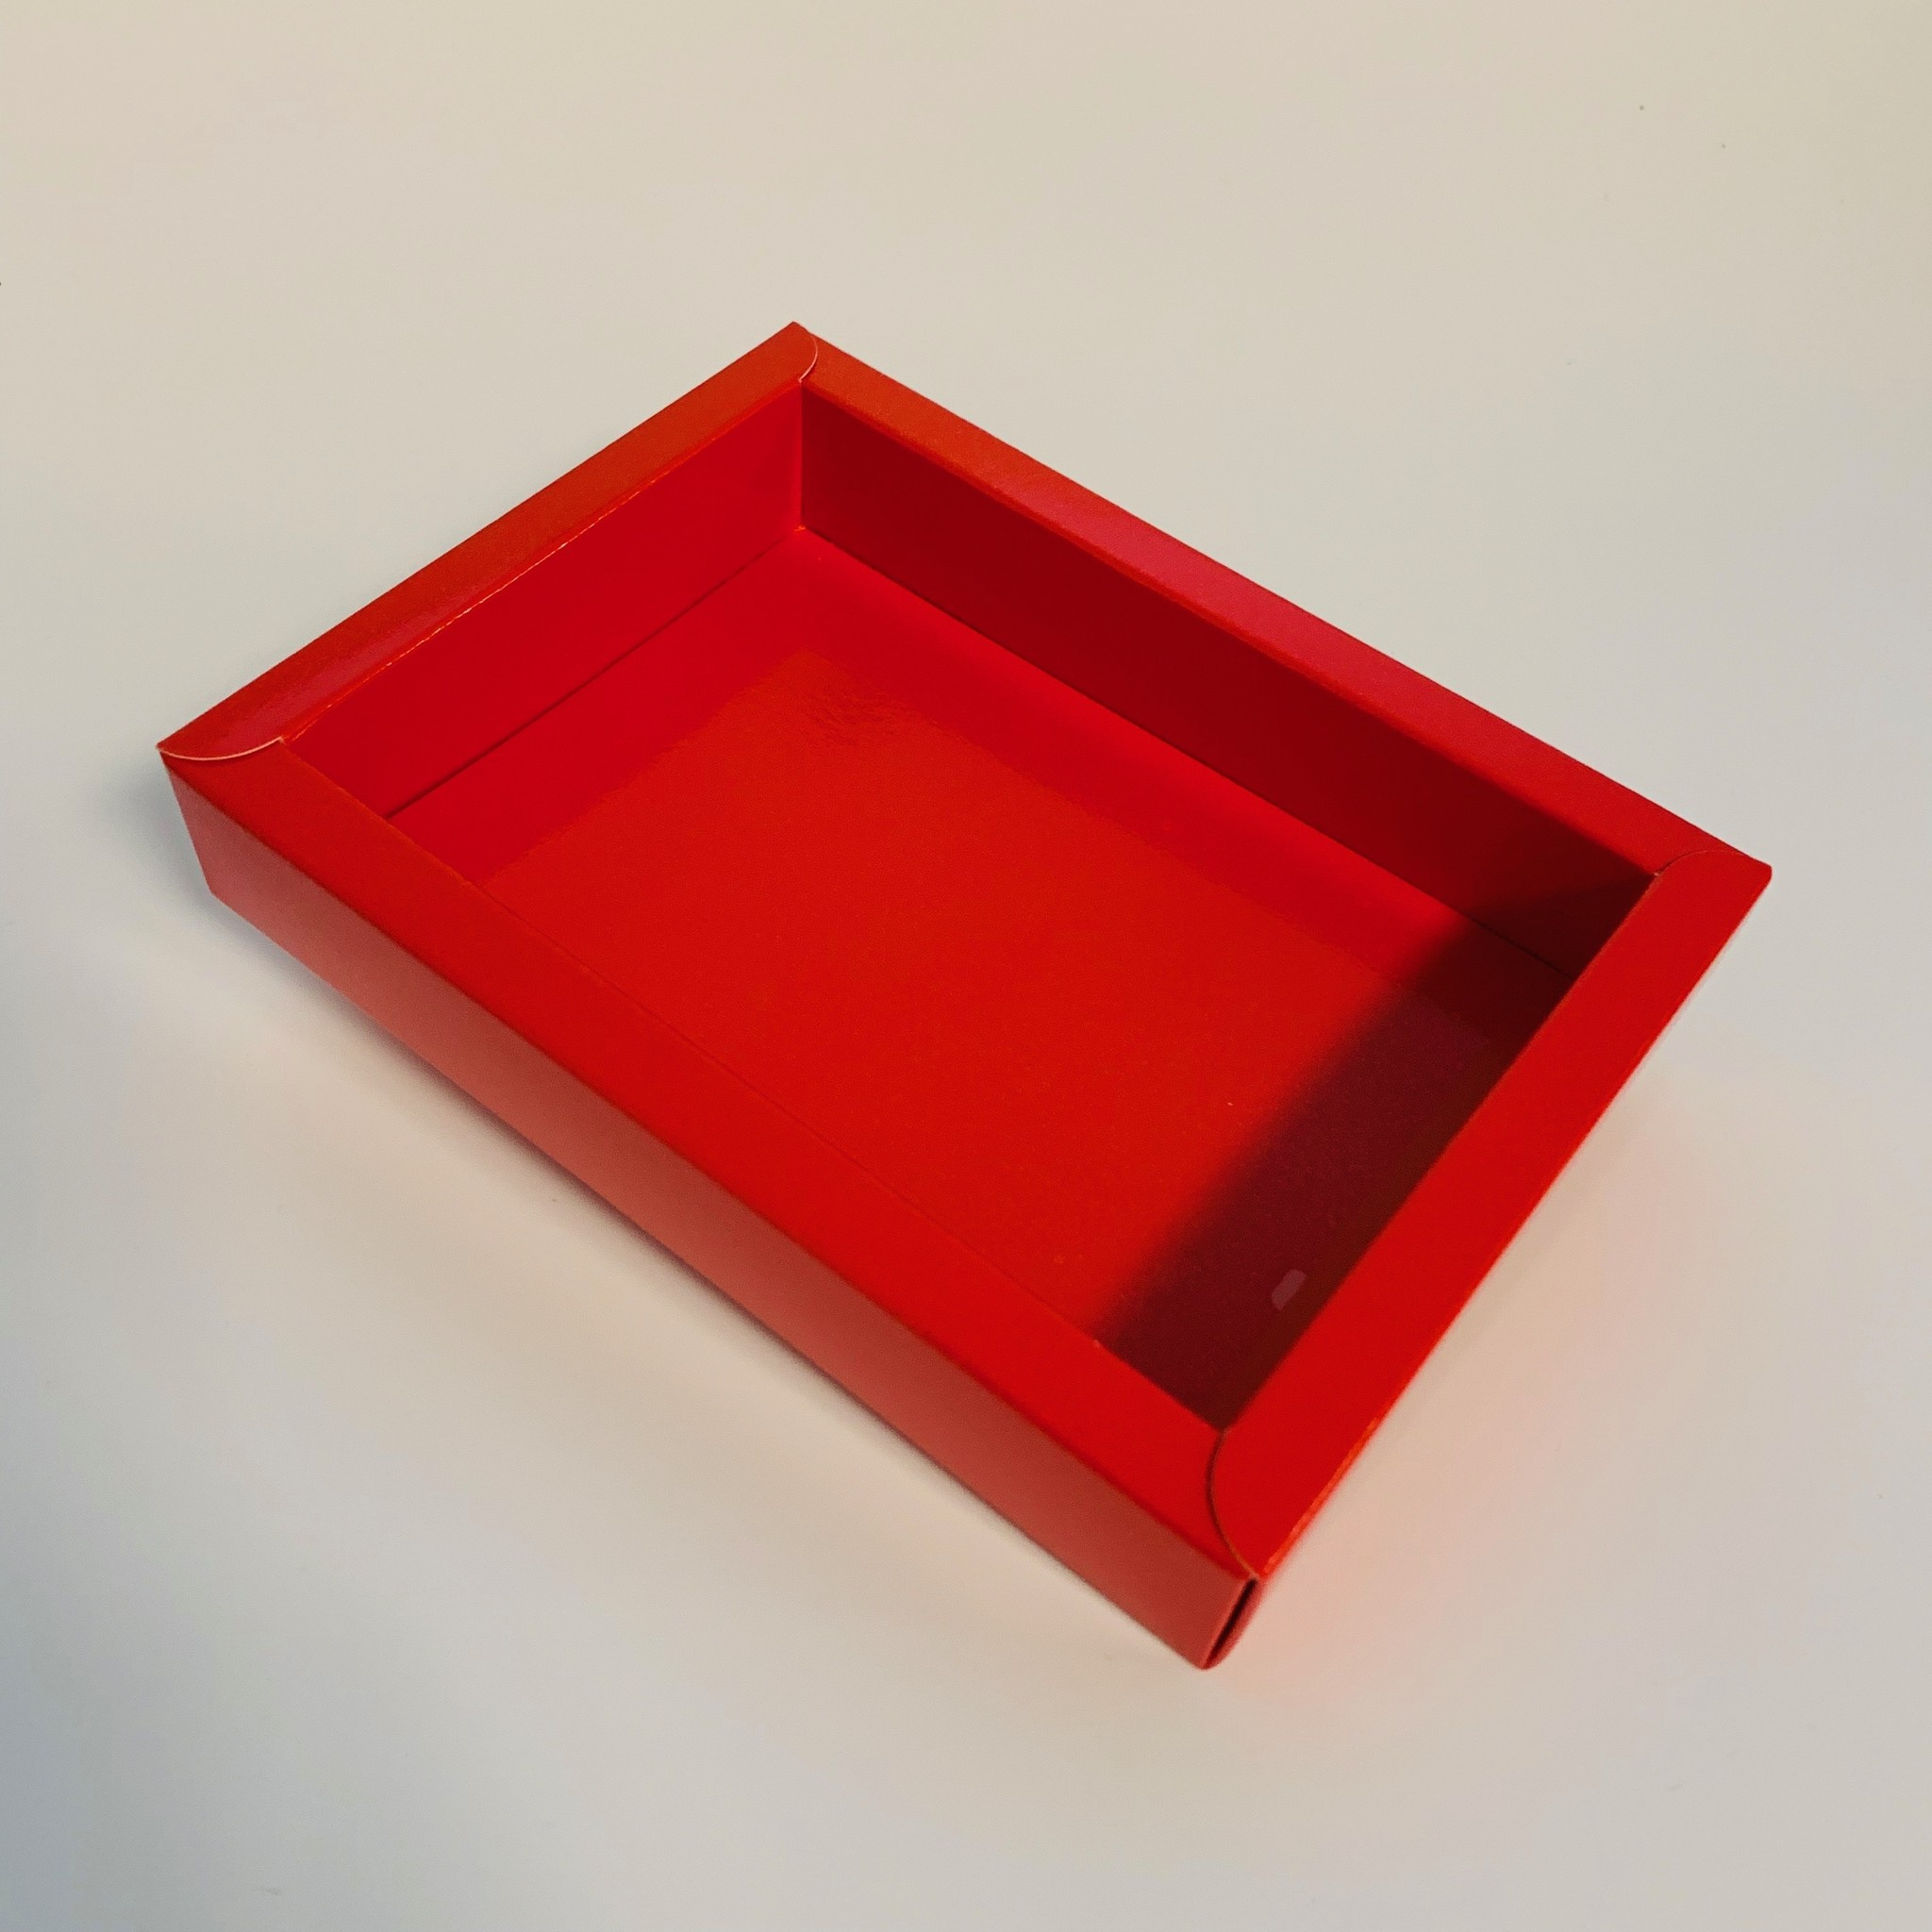 Hollewand verpakking NR.1 inhoud: 130x90x27mm